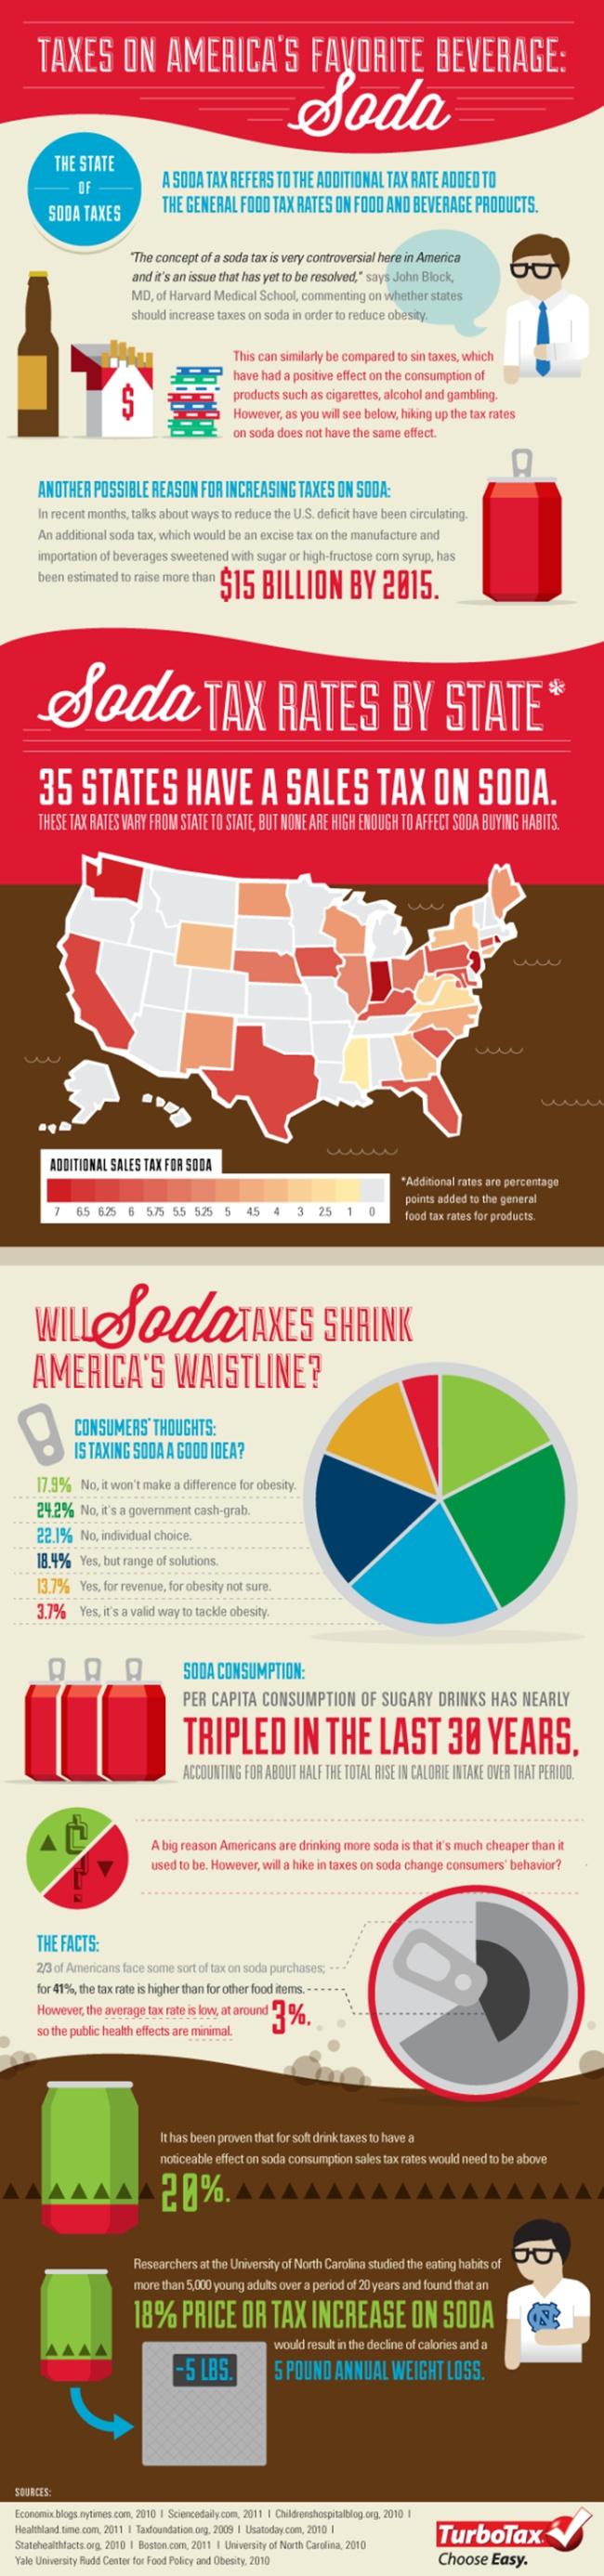 #SodaTax #Infographic